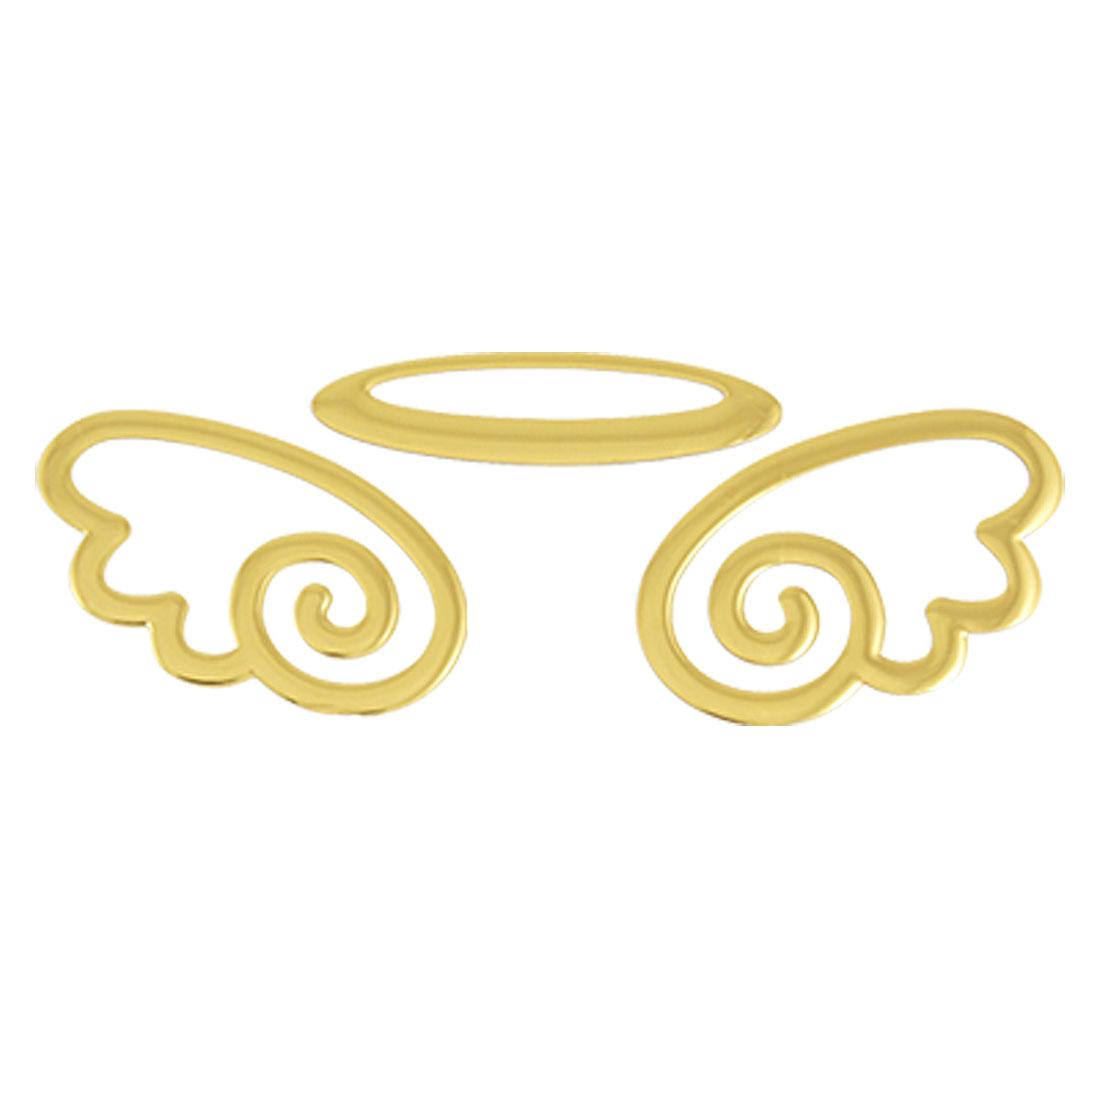 Car Auto Rear Emblem Logo Gold Tone Flying Angel Self Adhesive 3D Sticker